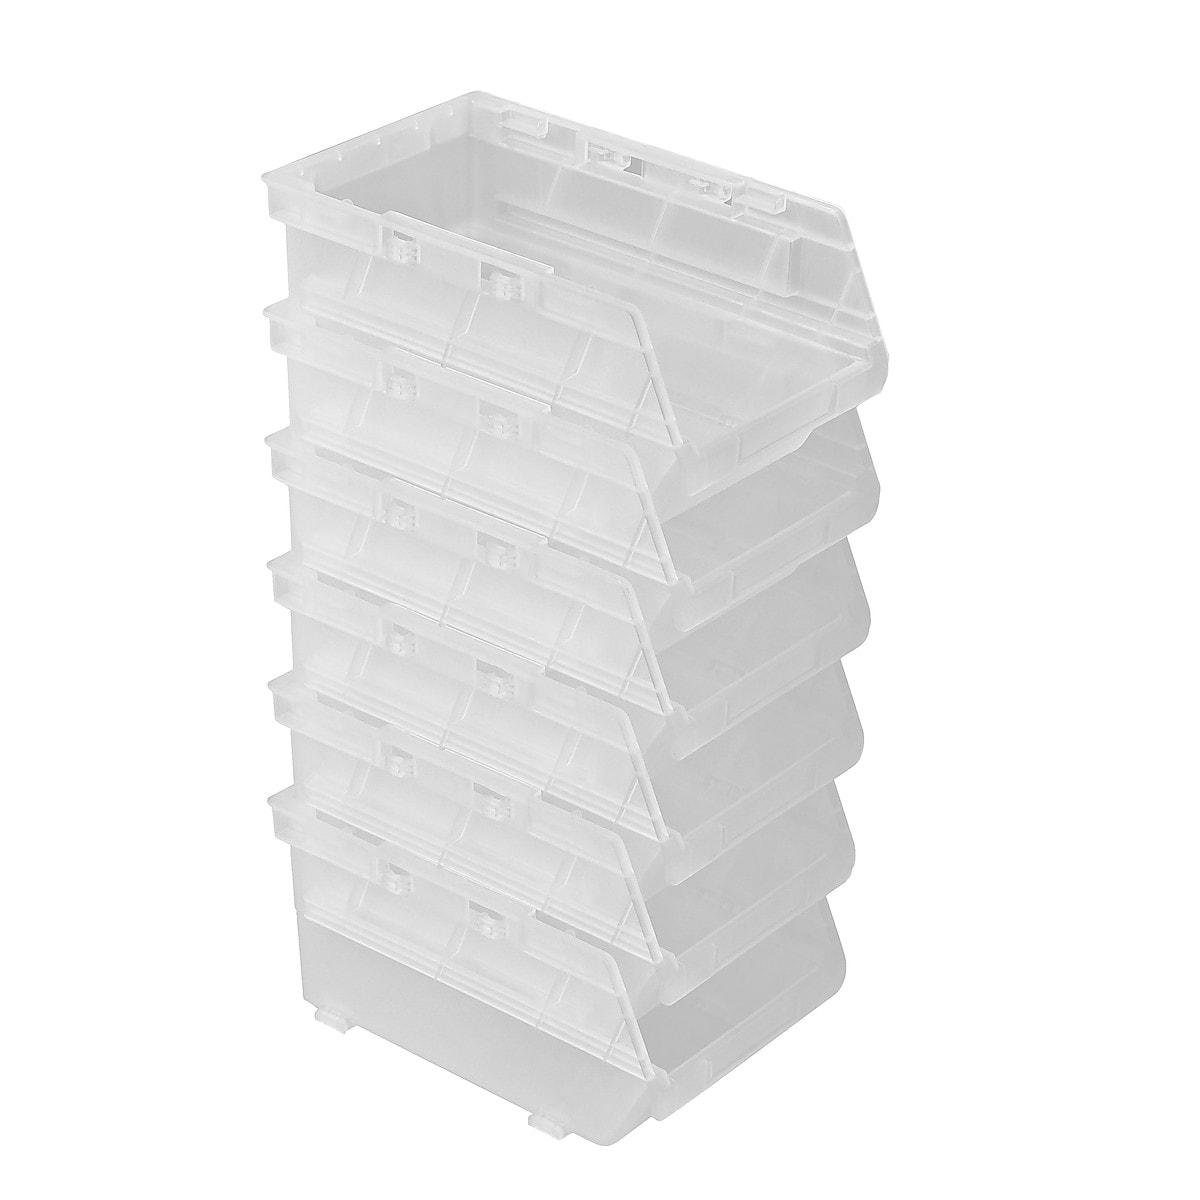 Cocraft FSS Parts Bins, 6-pack